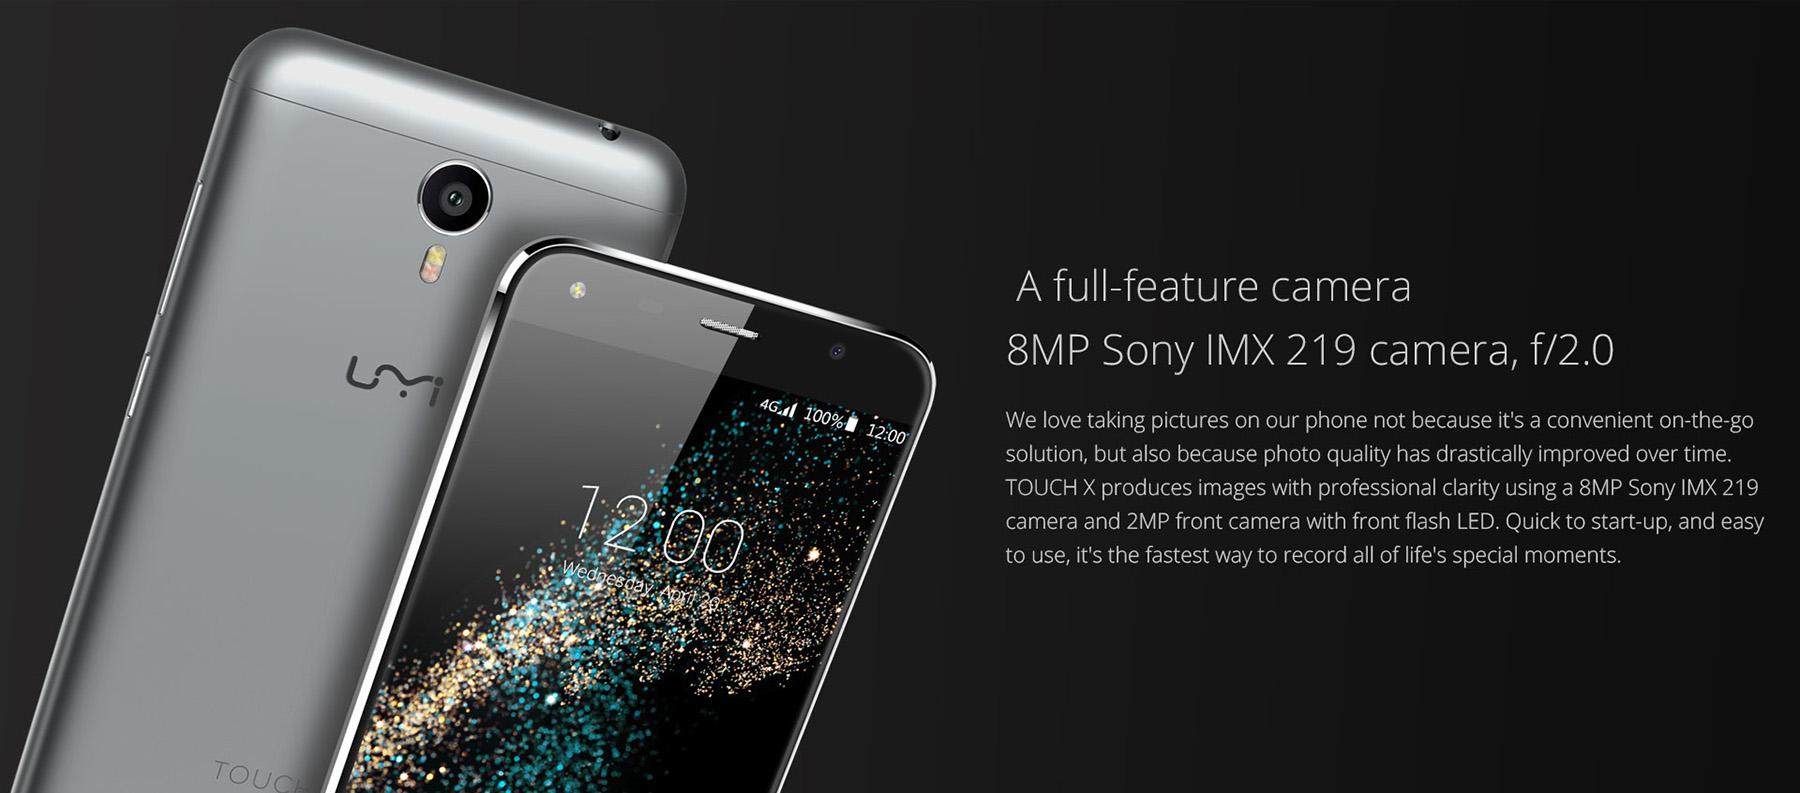 UMI TOUCH X, Kamera Sony Sensor, Test Bilder Video Sony Kamera, Umi Testbericht